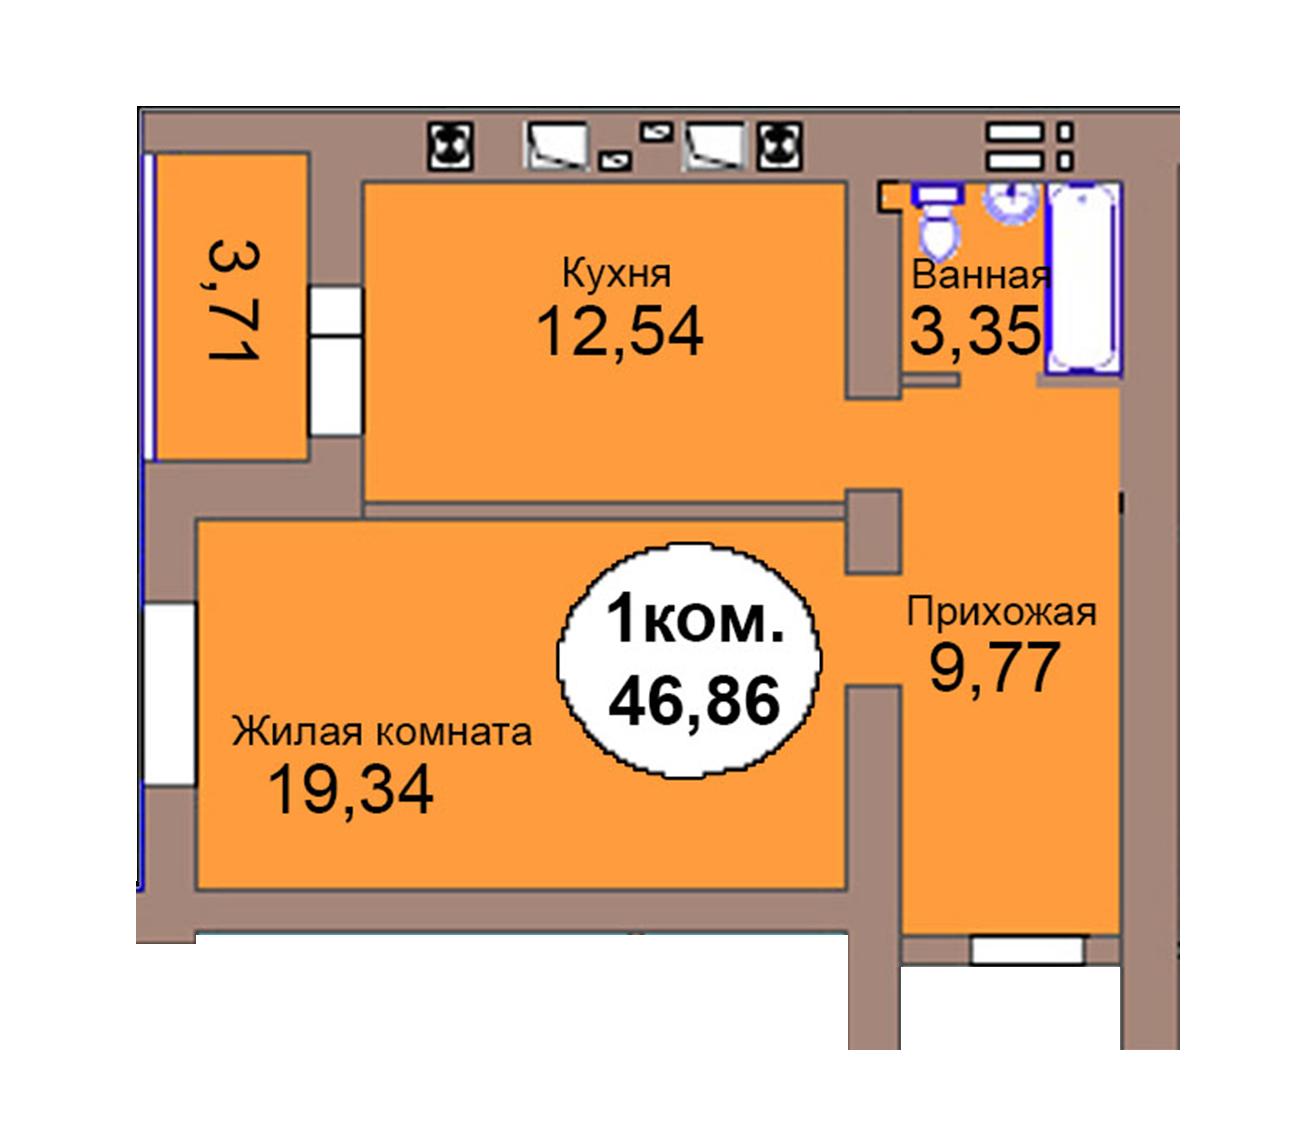 1-комн. кв. по пер. Калининградский, 4  кв. 83 в Калининграде